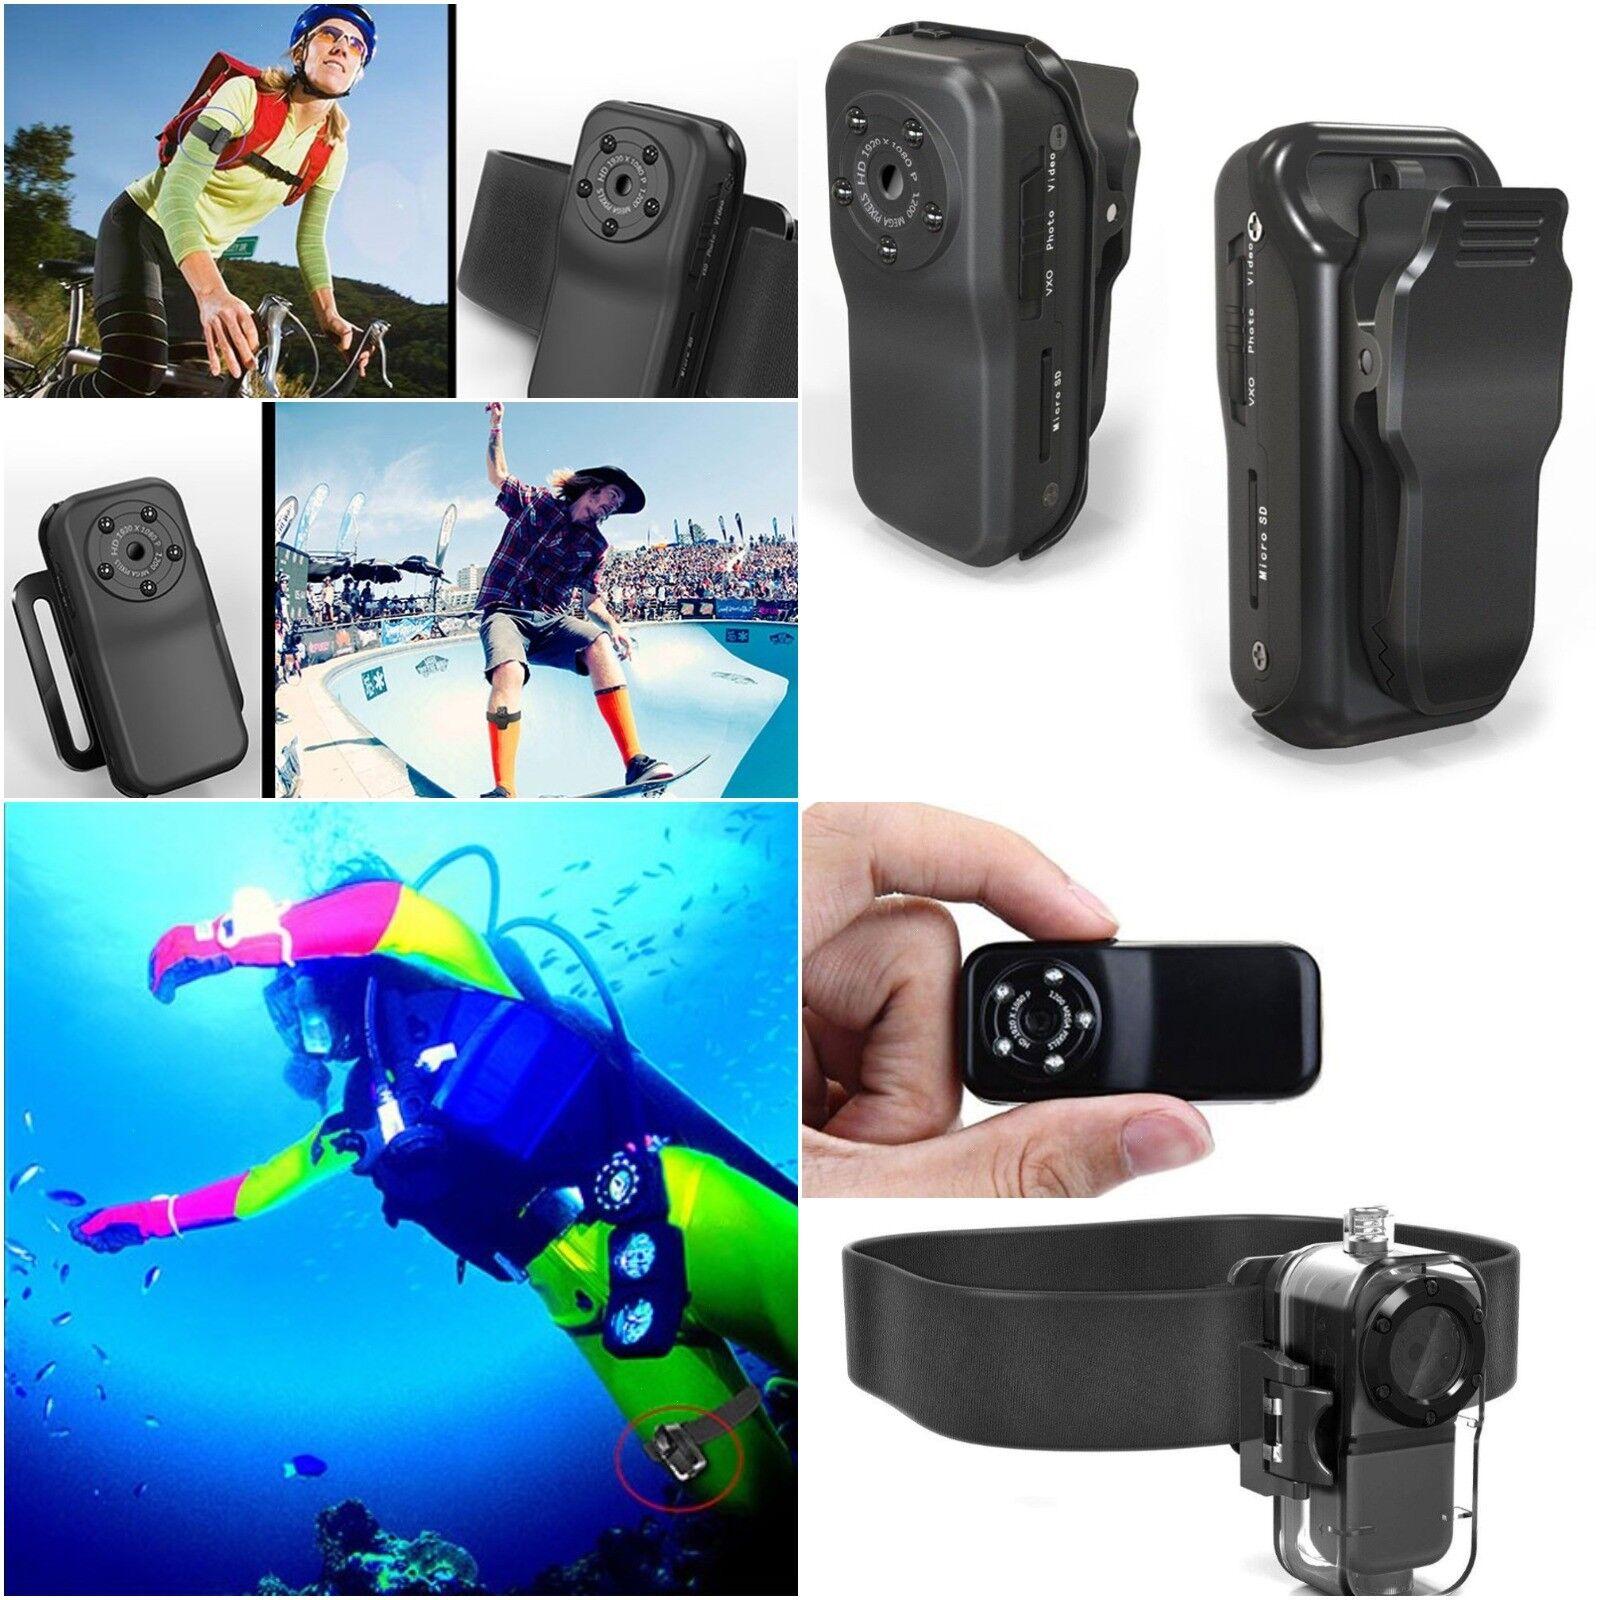 DV Helmet Camera FULL HD 1080P 12MP Mini DV Waterproof DVR Night Vision Recorder